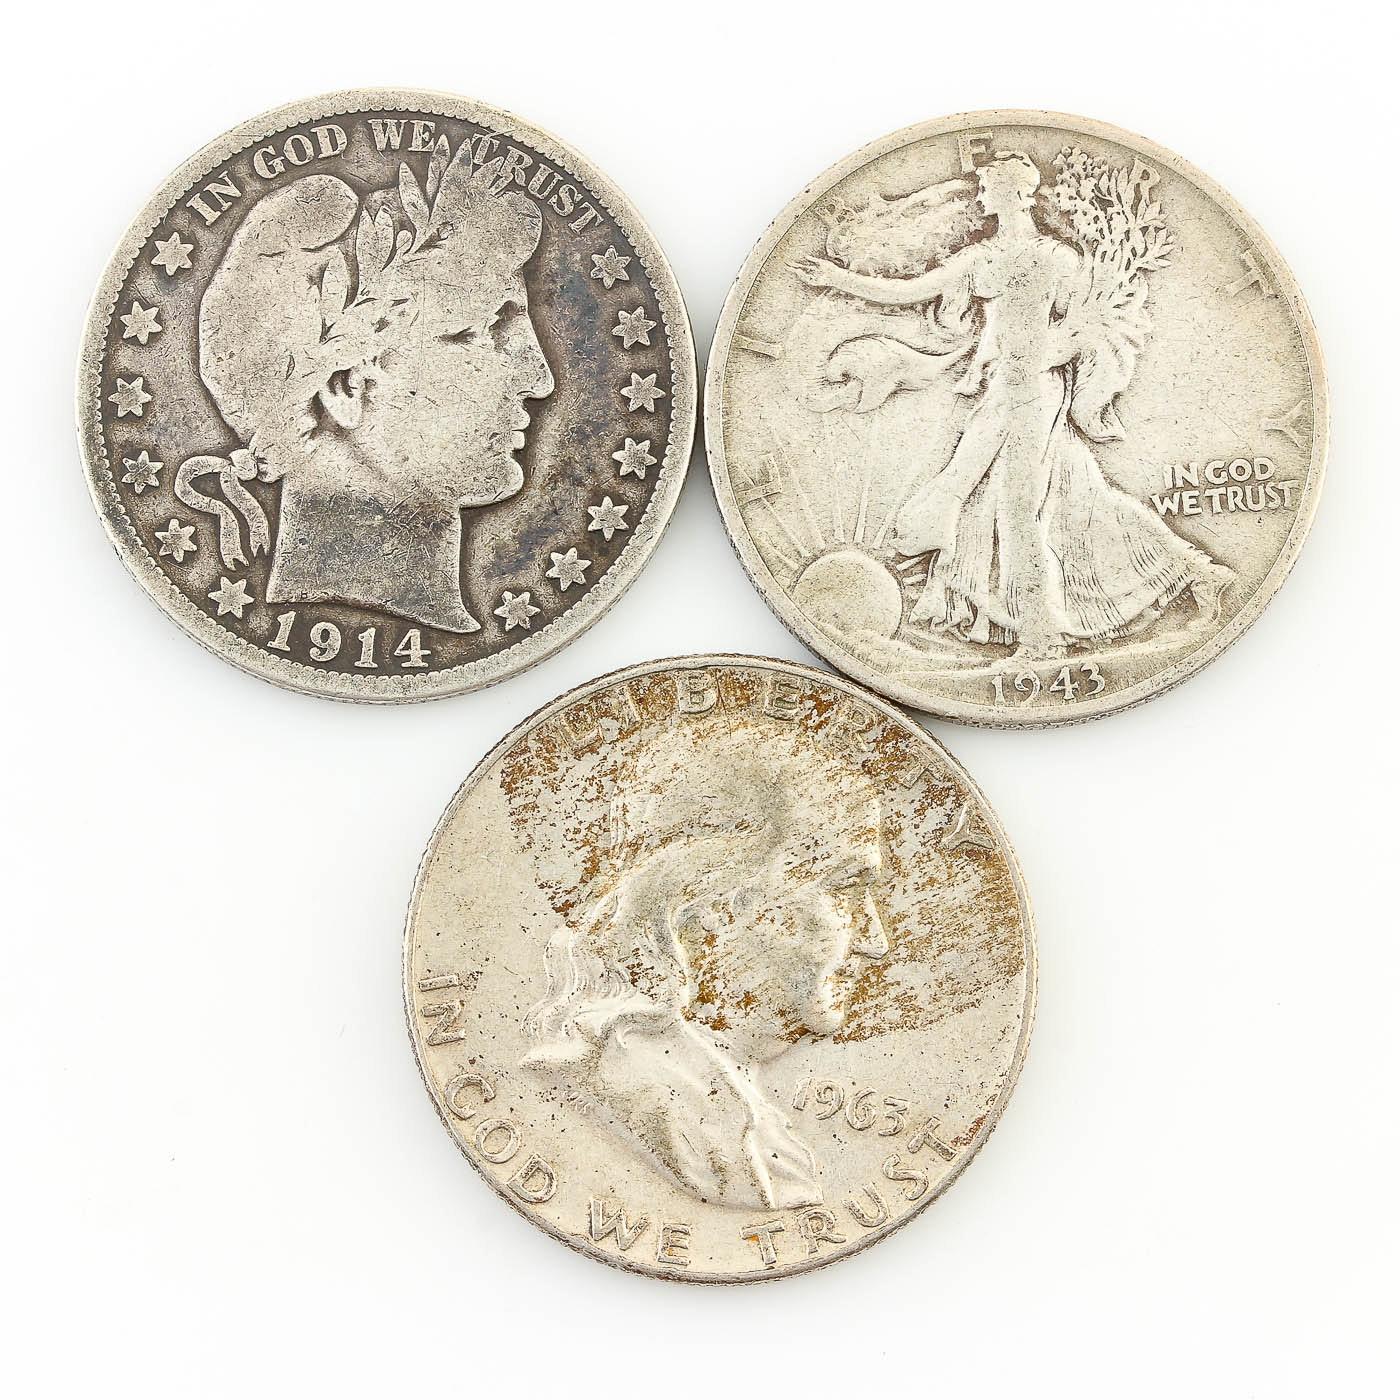 Barber, Walking Liberty, and Franklin Half Dollars 1914-1963